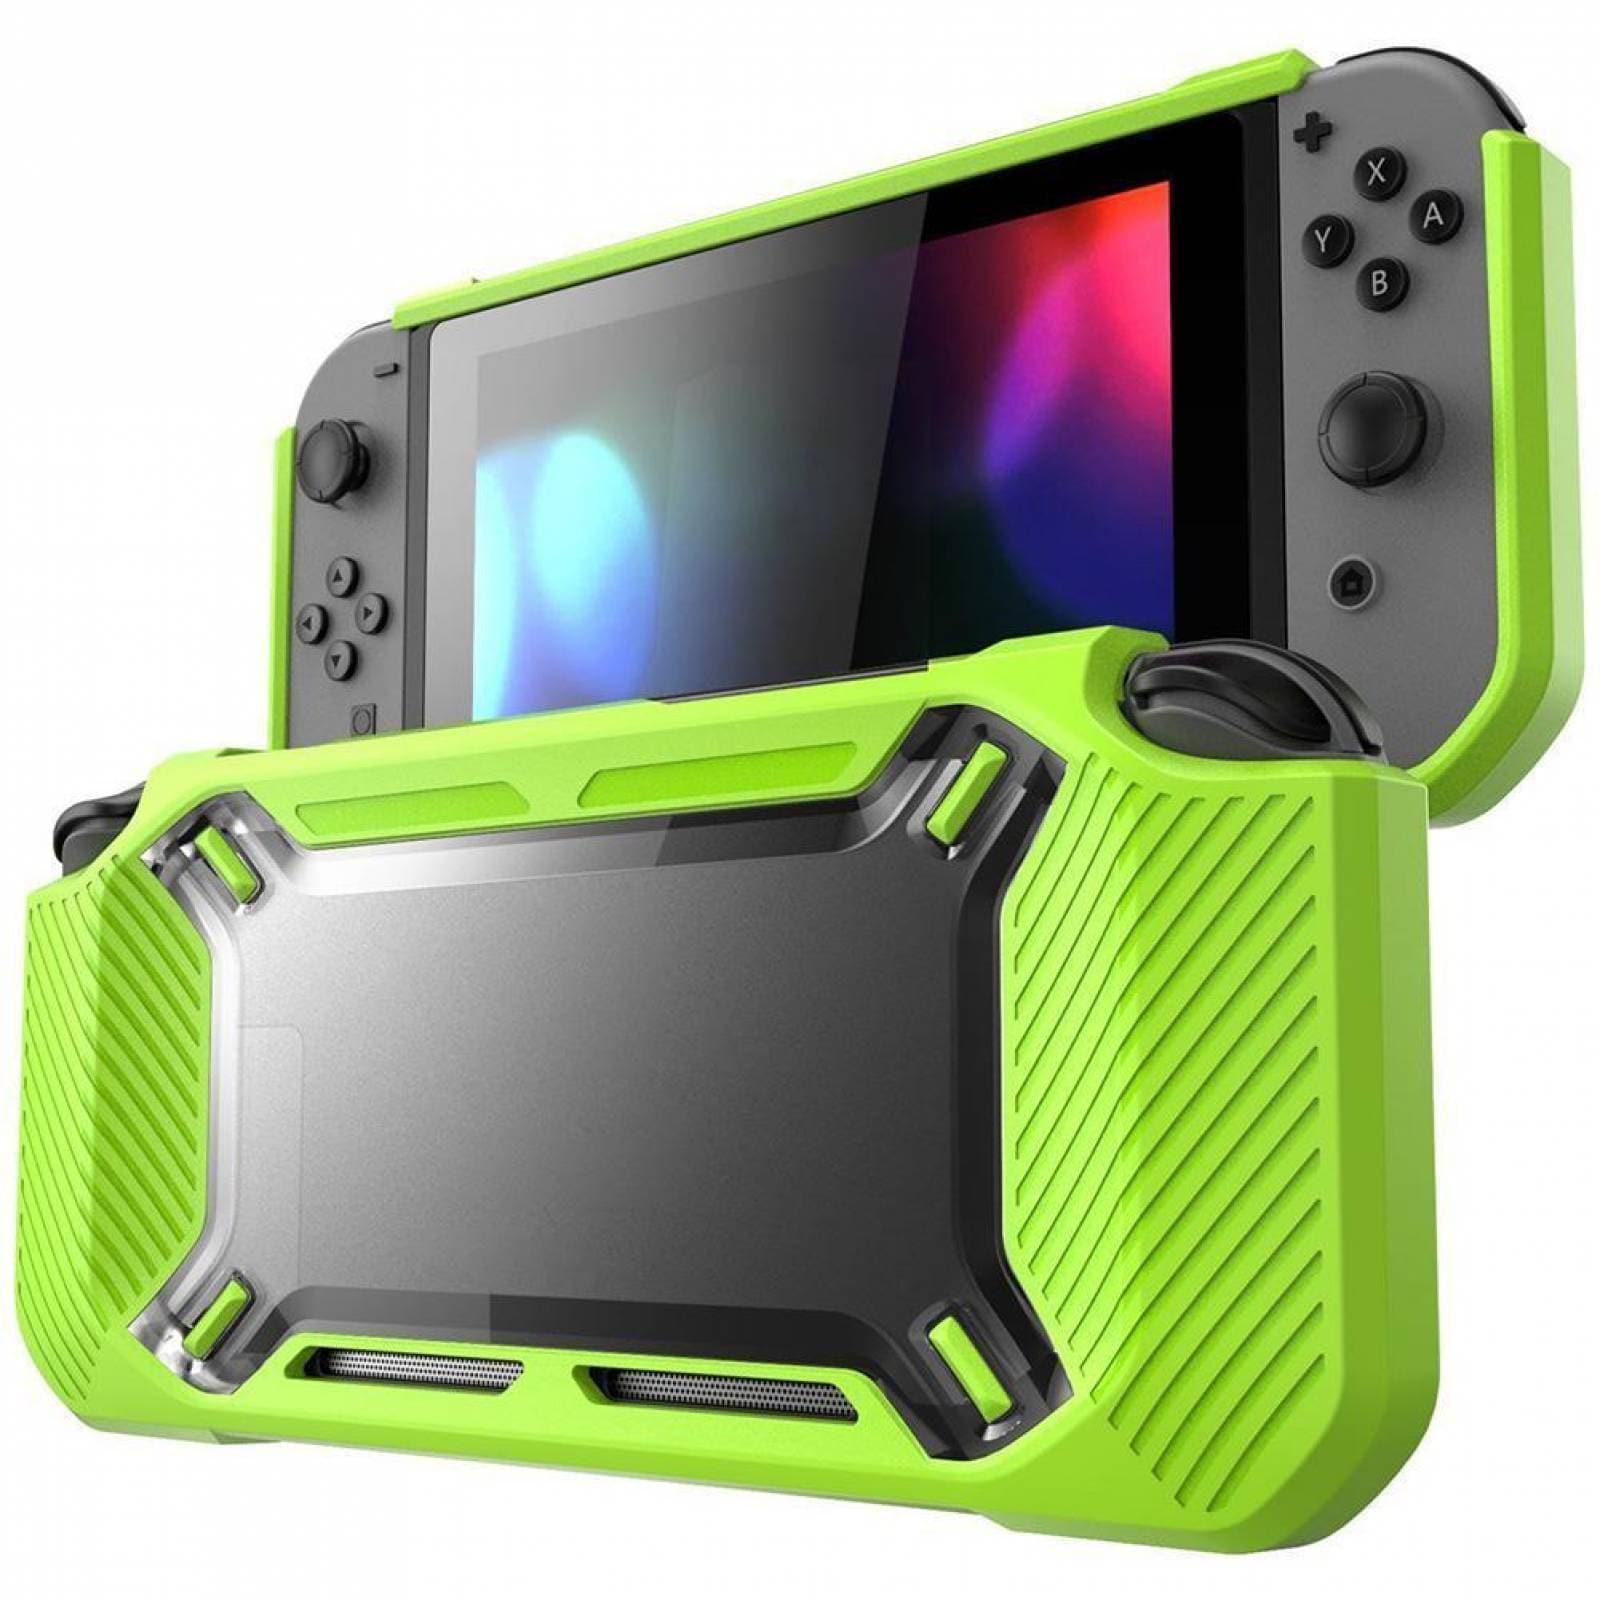 Protector Rigido Verde Nintendo Switch